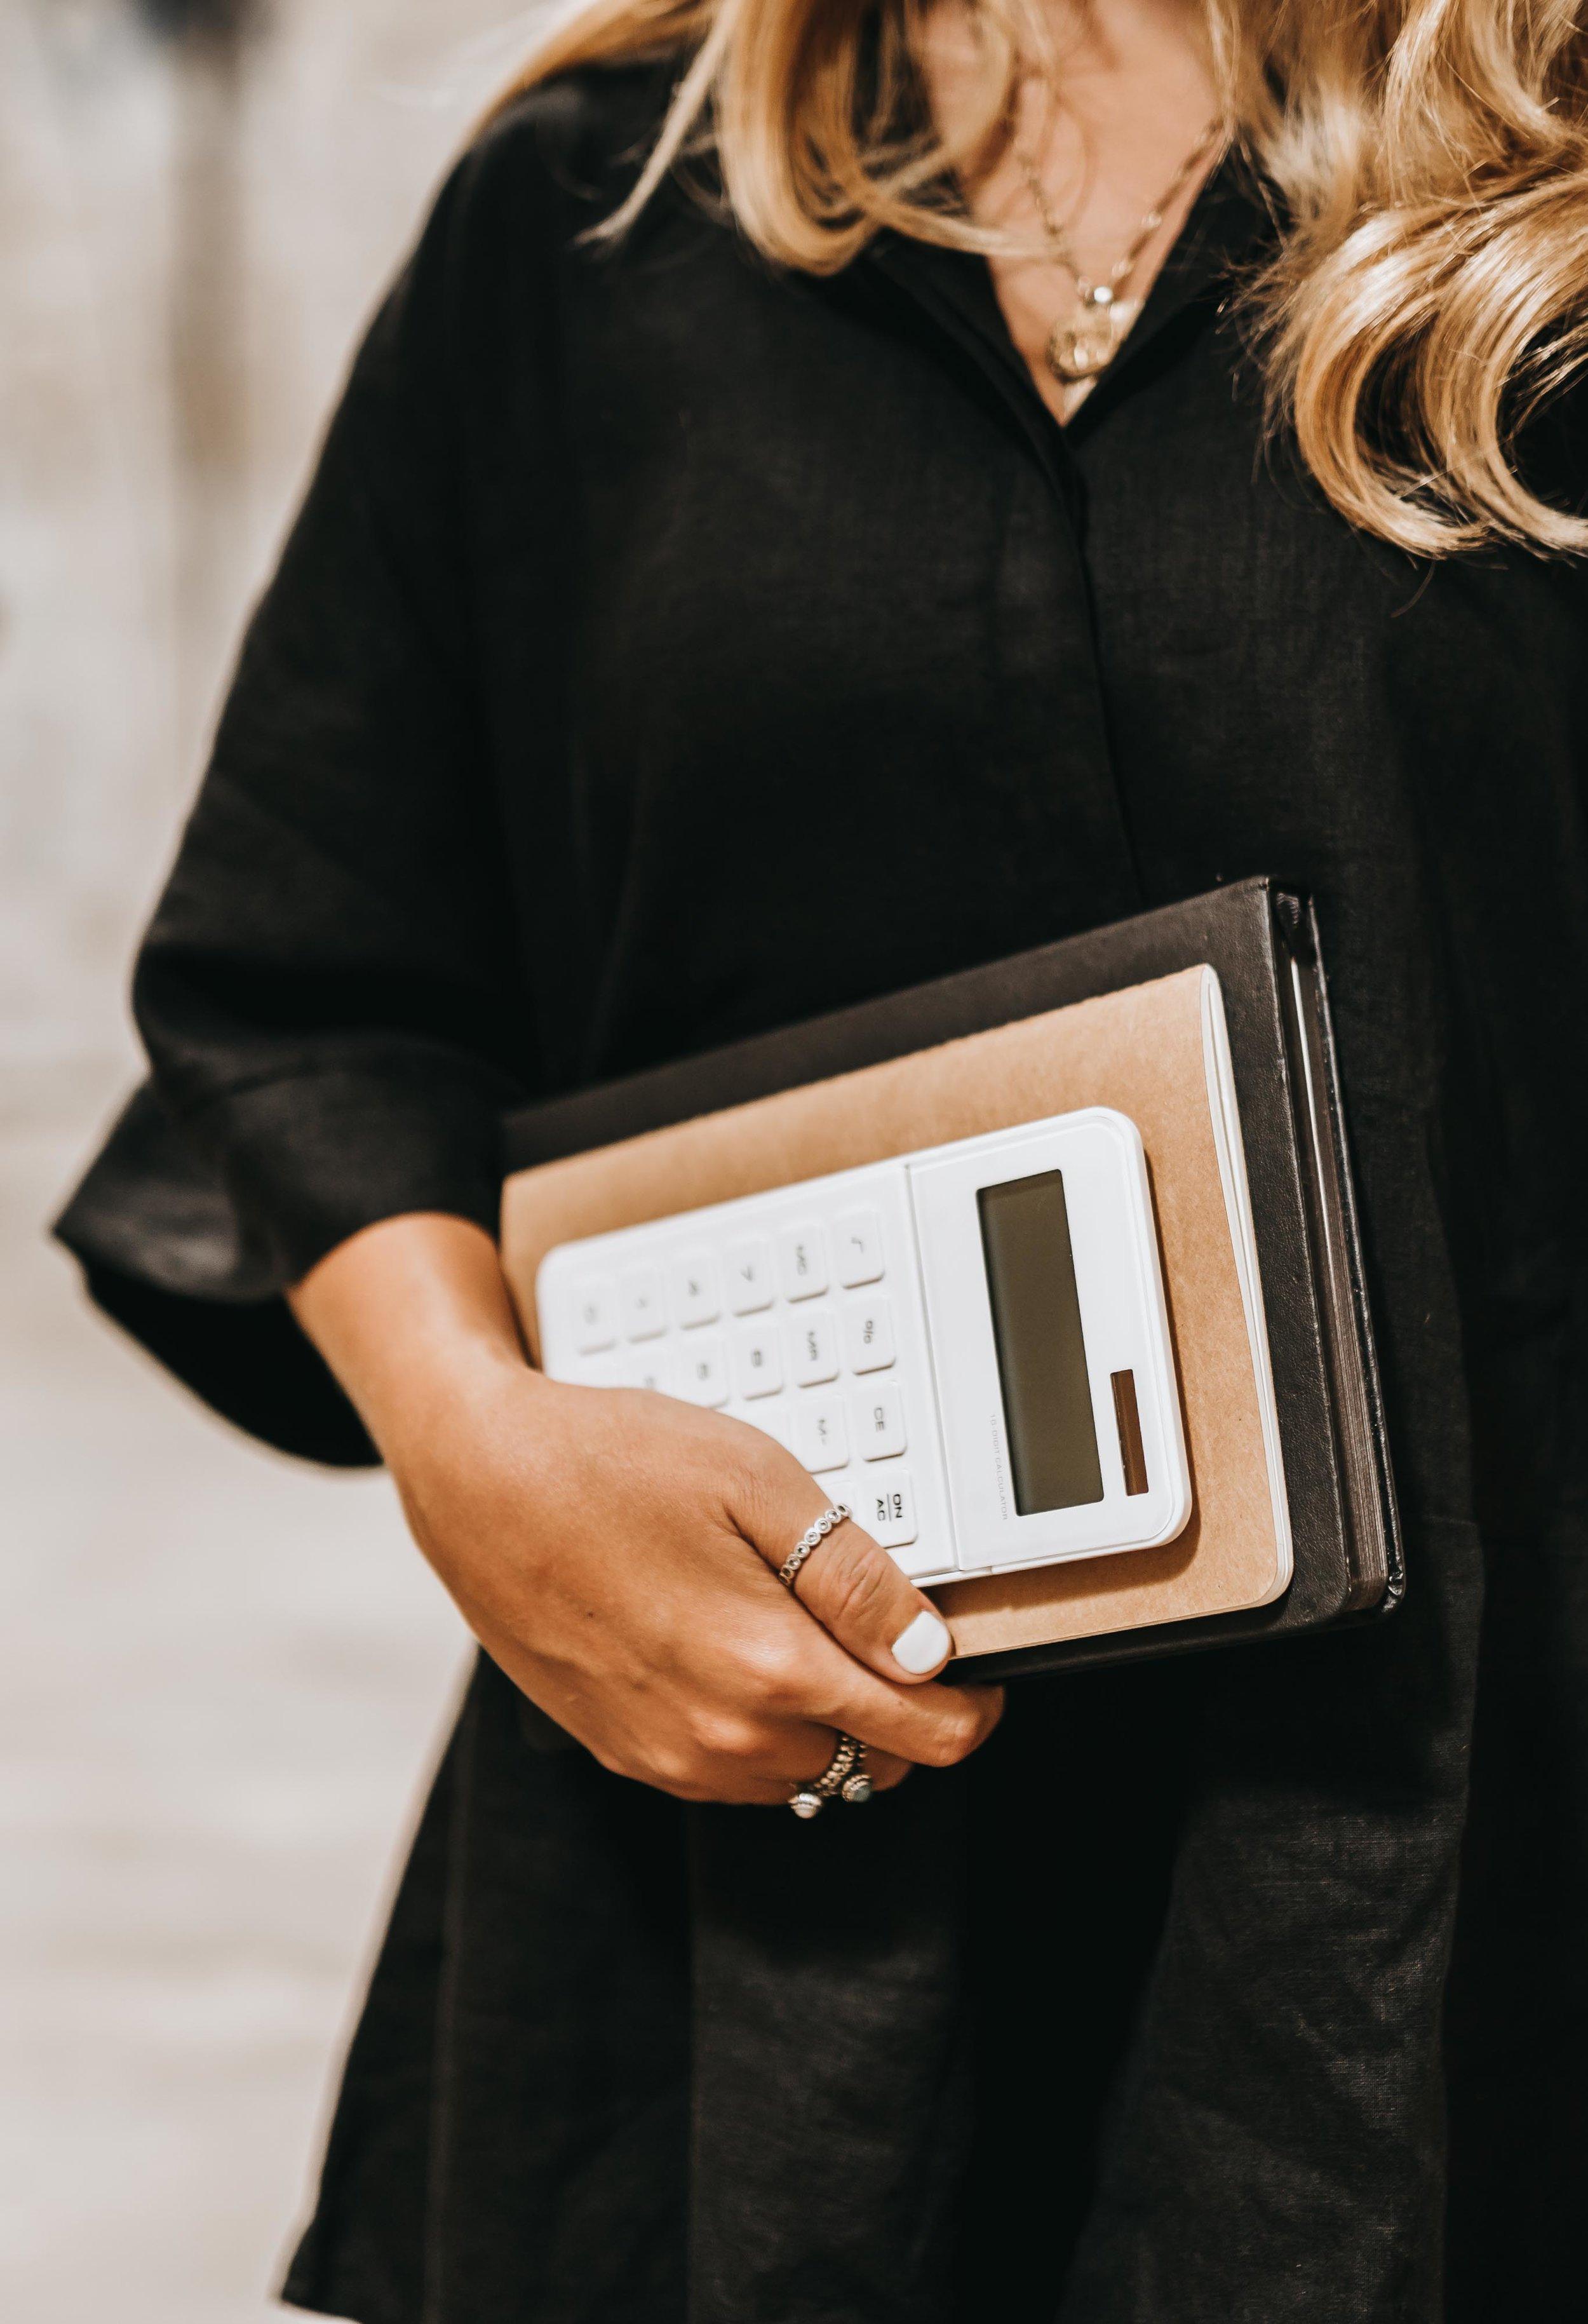 keira-mason-zest-bookkeeping-solutions-holding-calculator.jpg